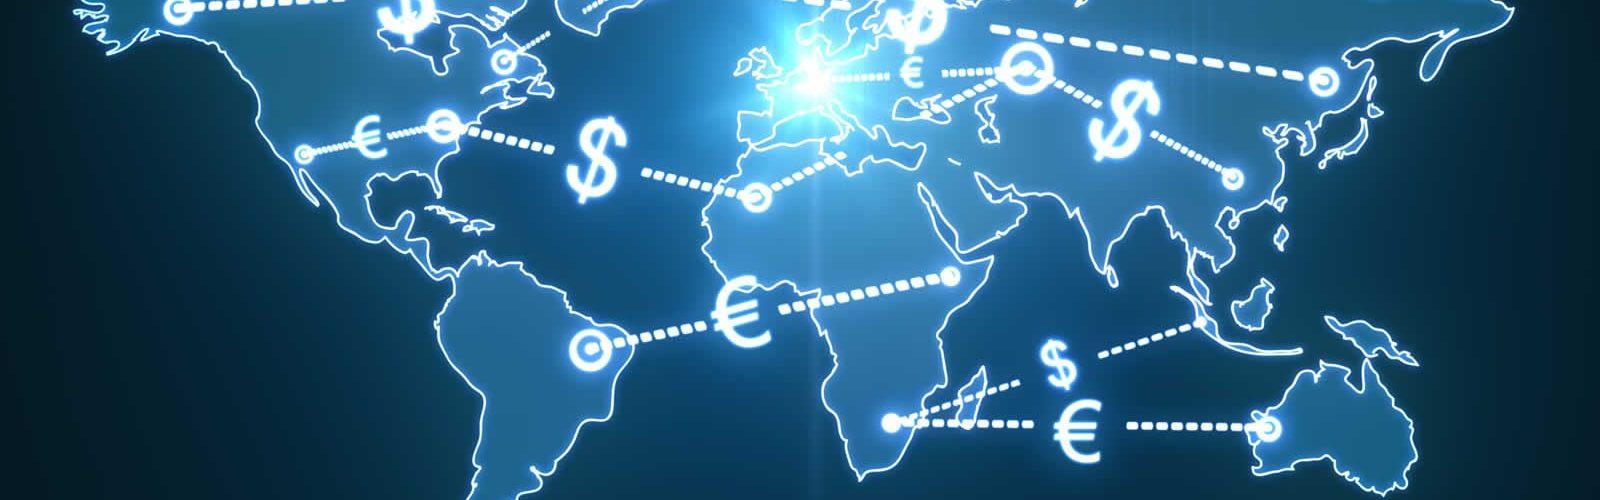 12-services-transfert-argent-change-texas